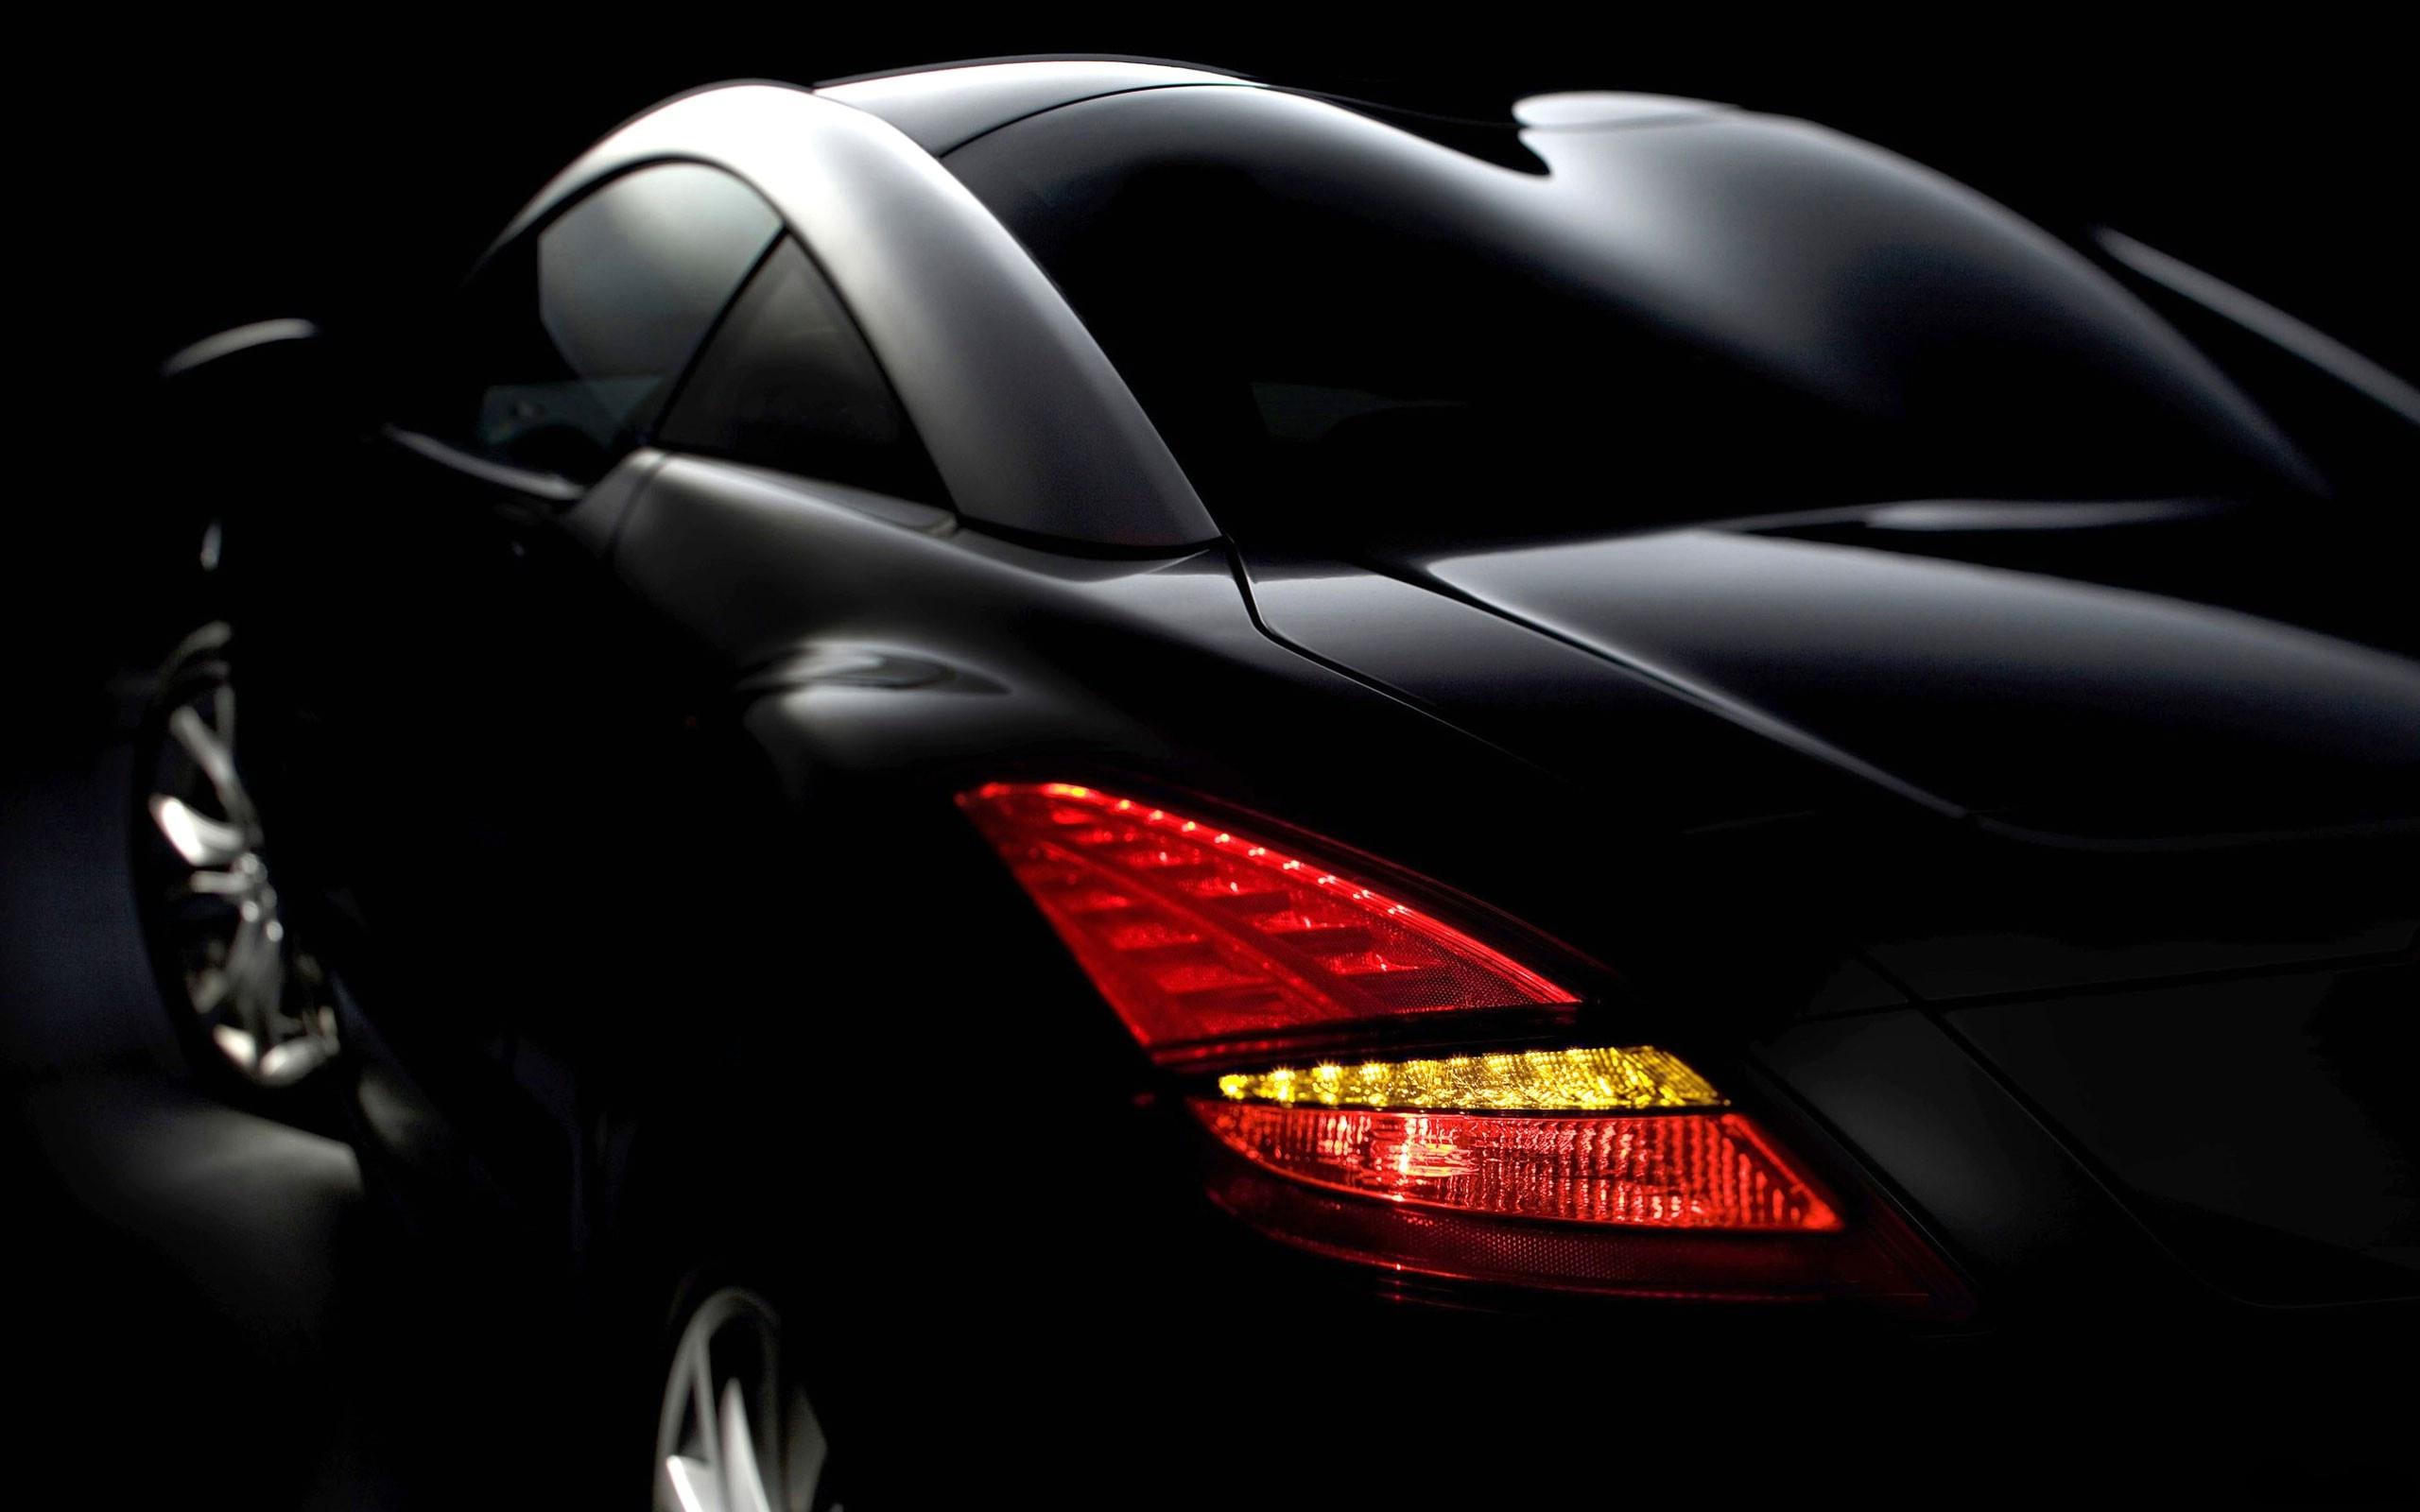 Muscle Car Wallpaper Black And White 7 Peugeot Rcz Hd Duvar Kağıtları Arka Planlar